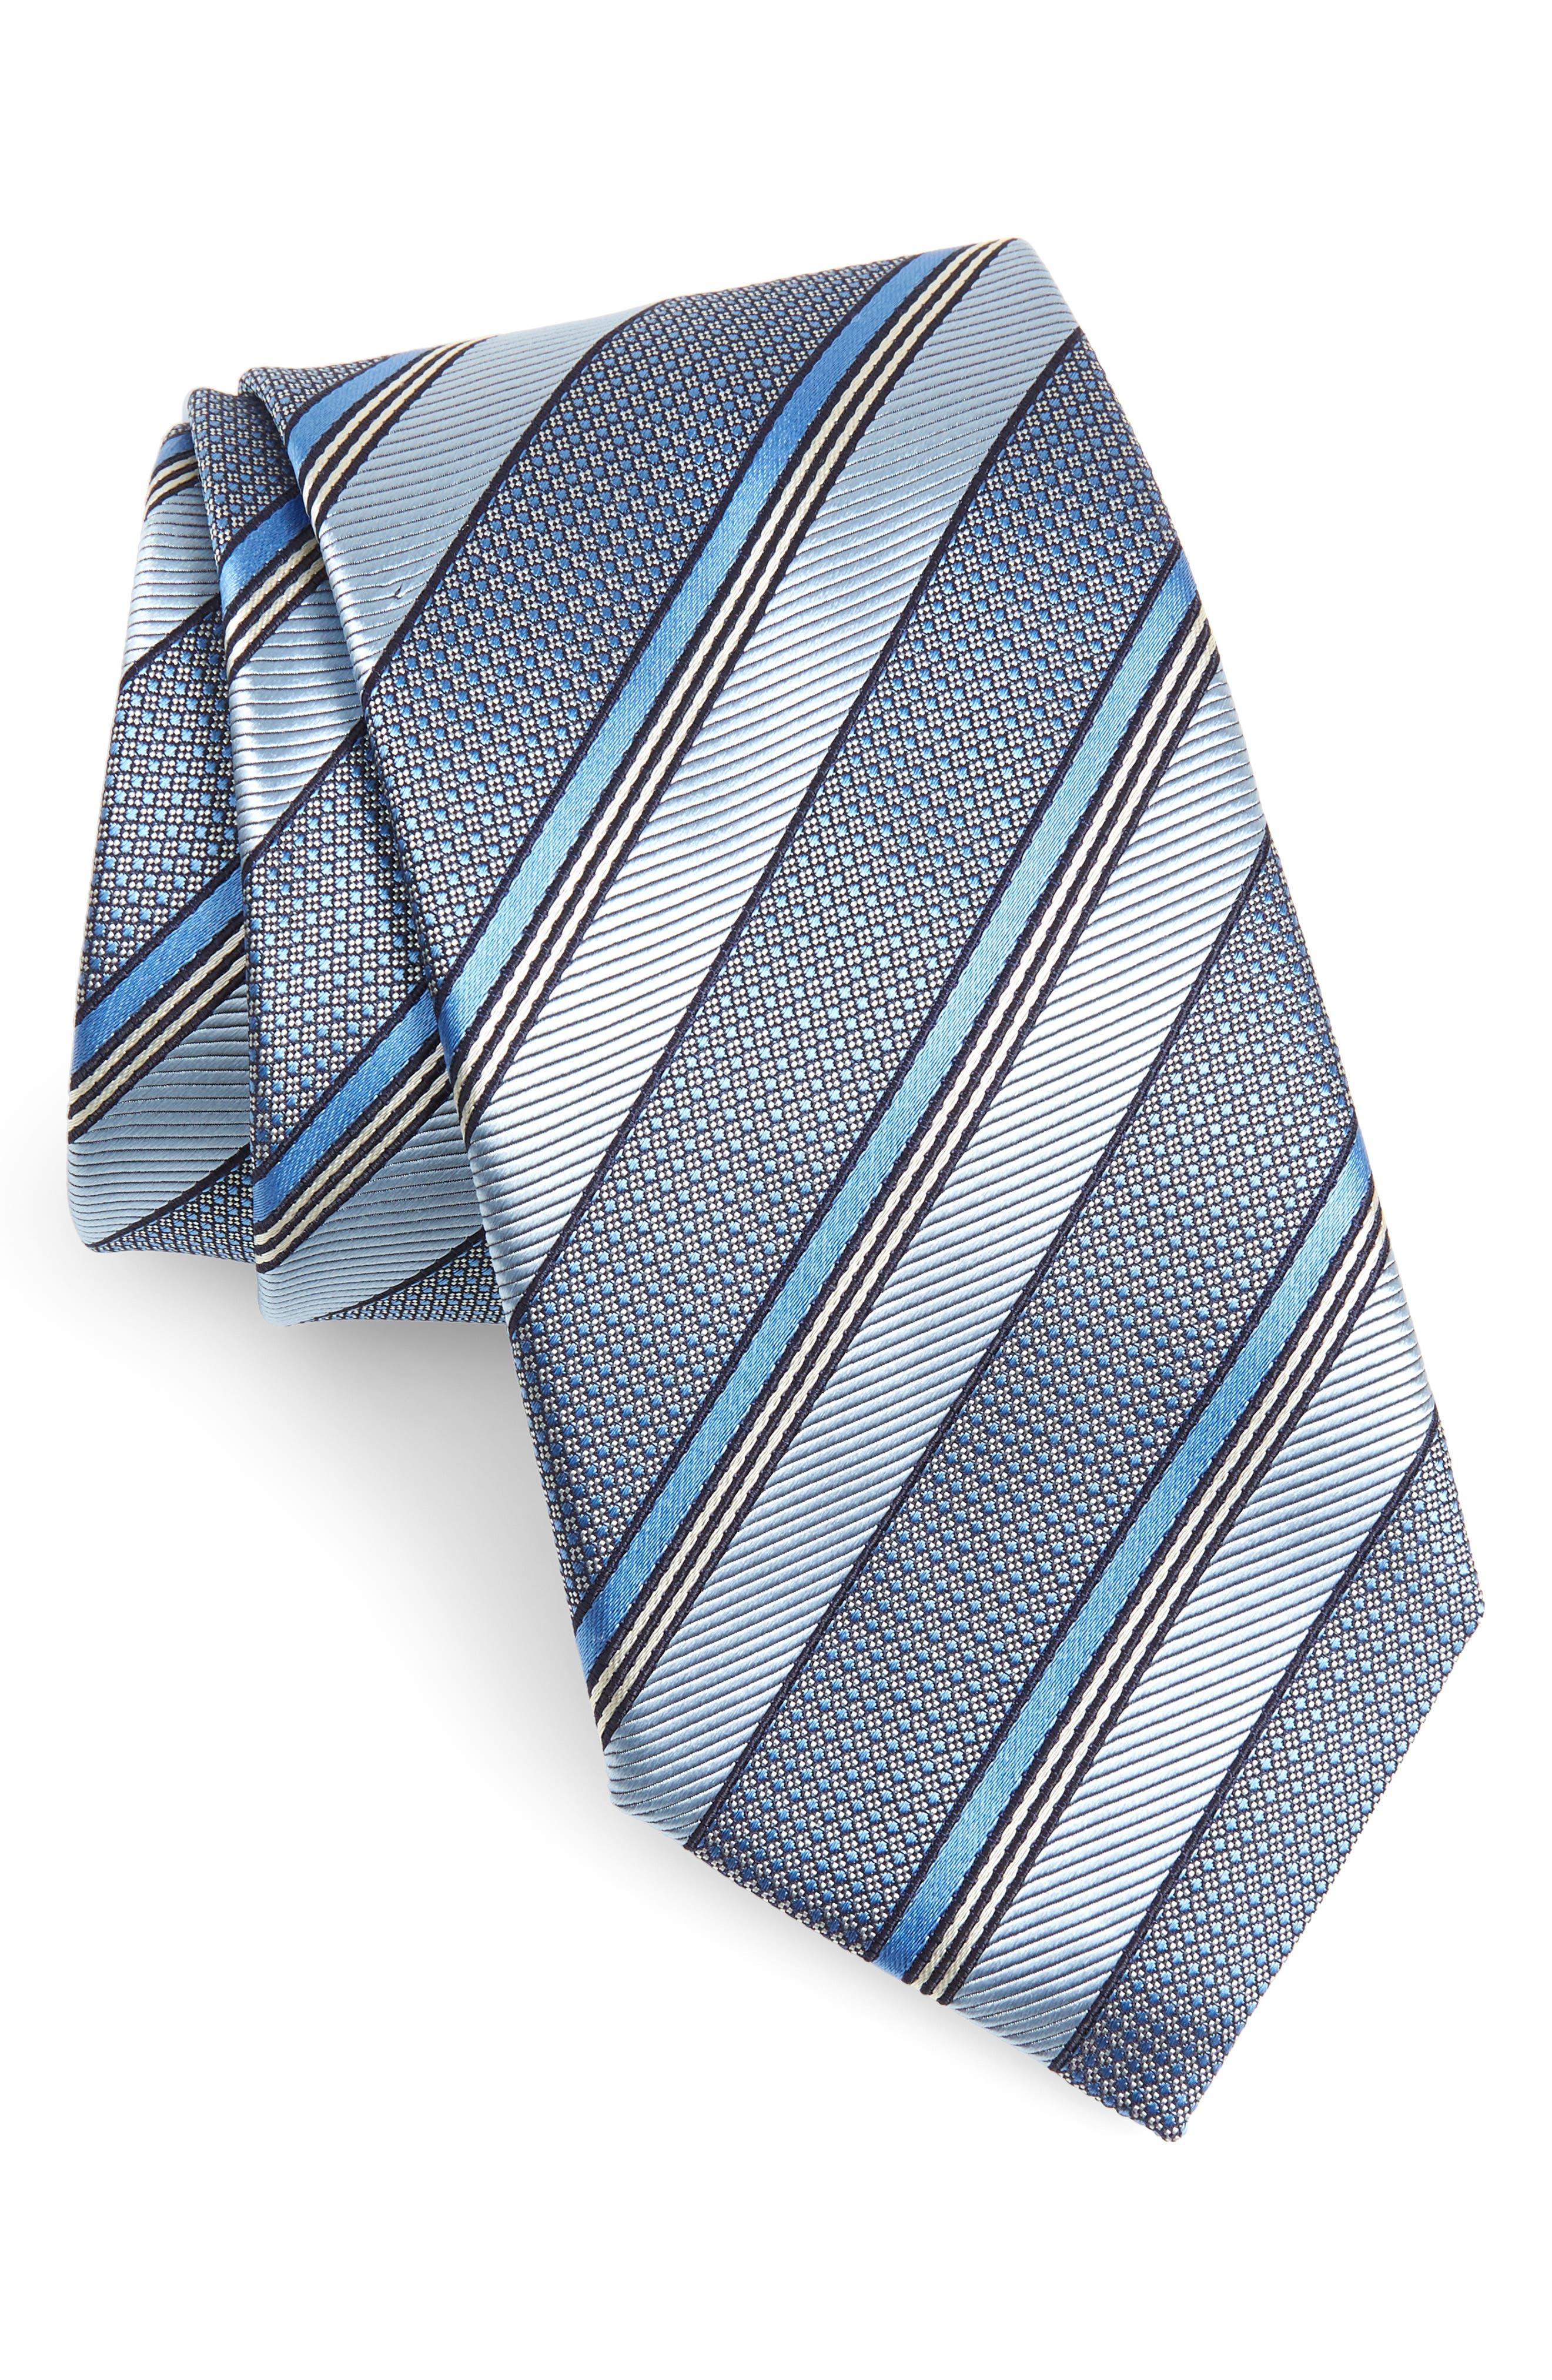 CANALI, Stripe Silk Tie, Main thumbnail 1, color, BLUE